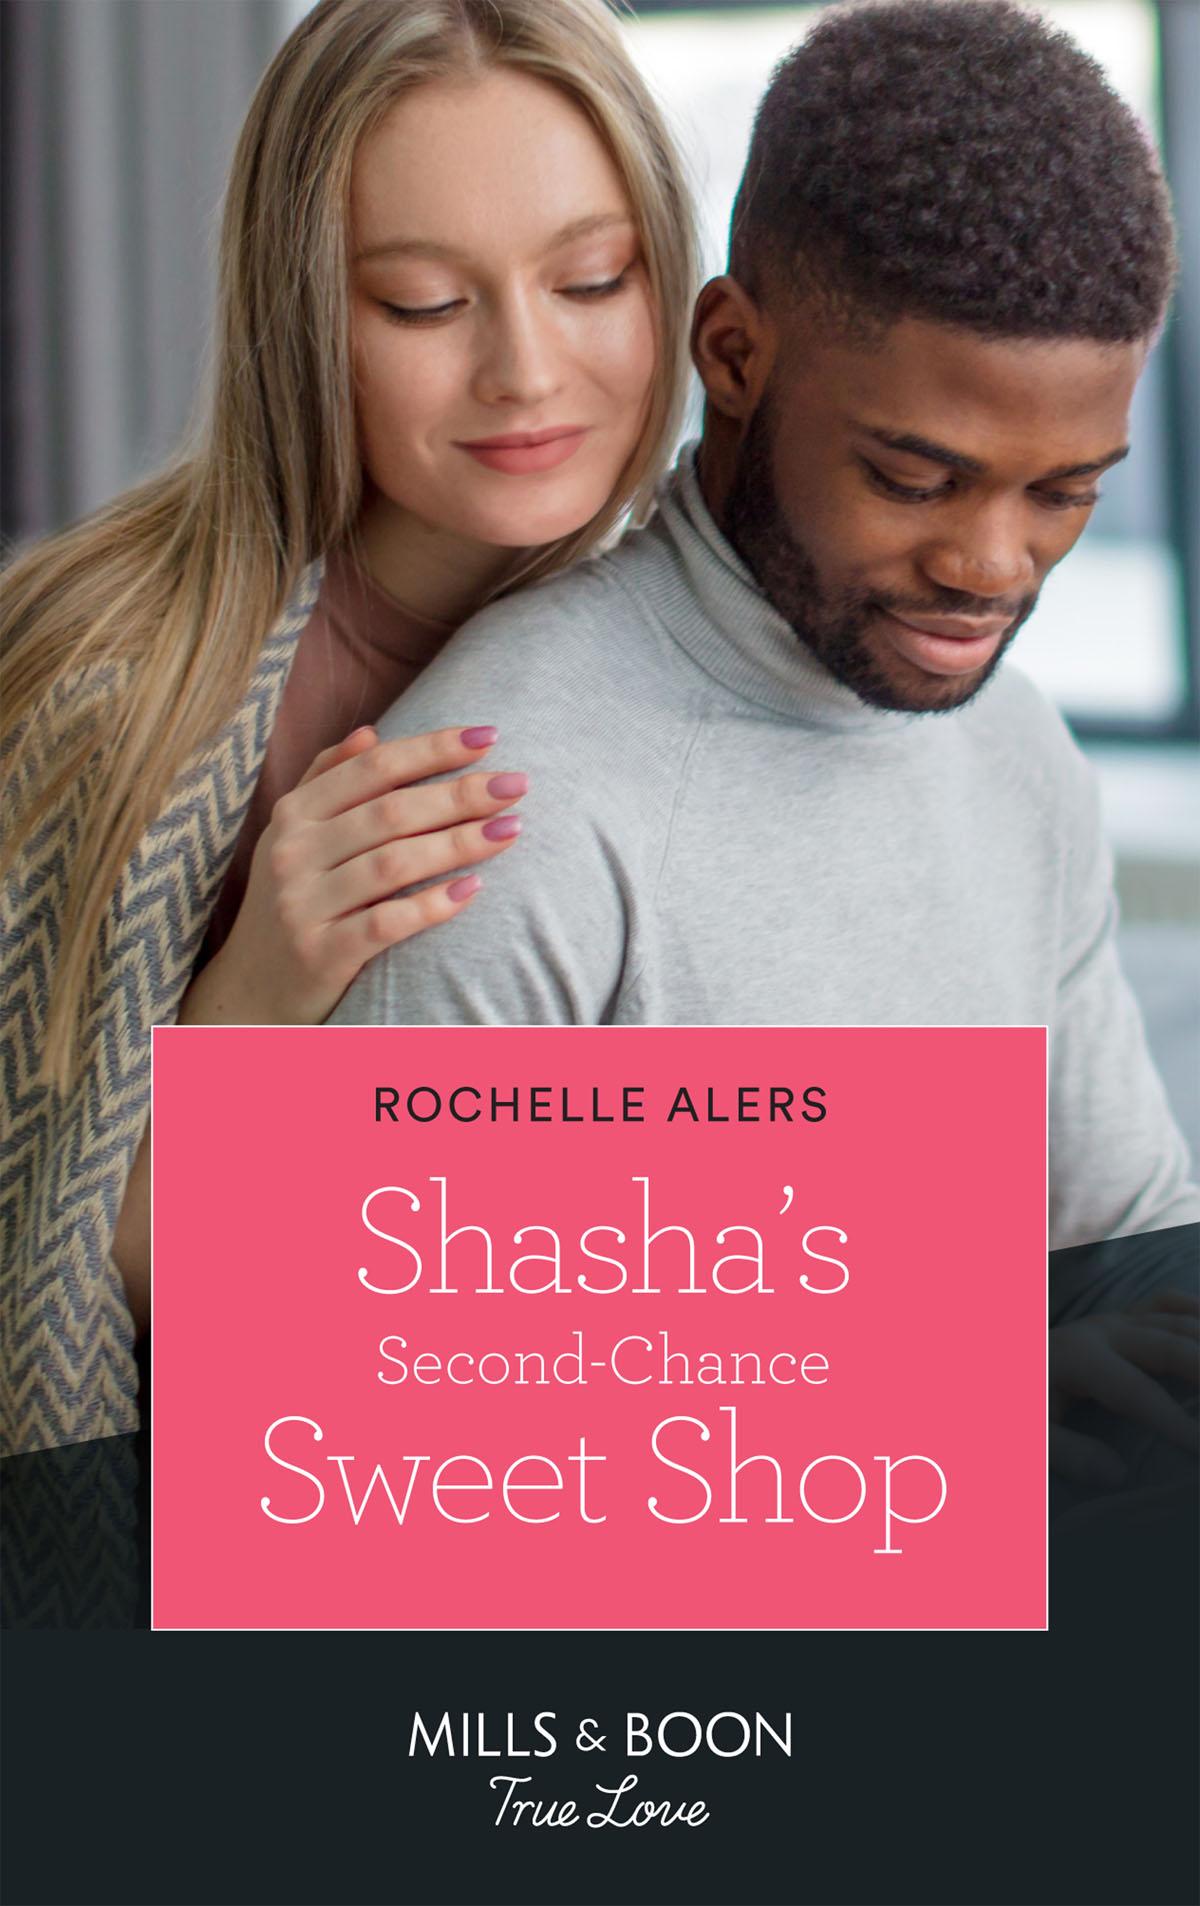 цена на Rochelle Alers Second-Chance Sweet Shop